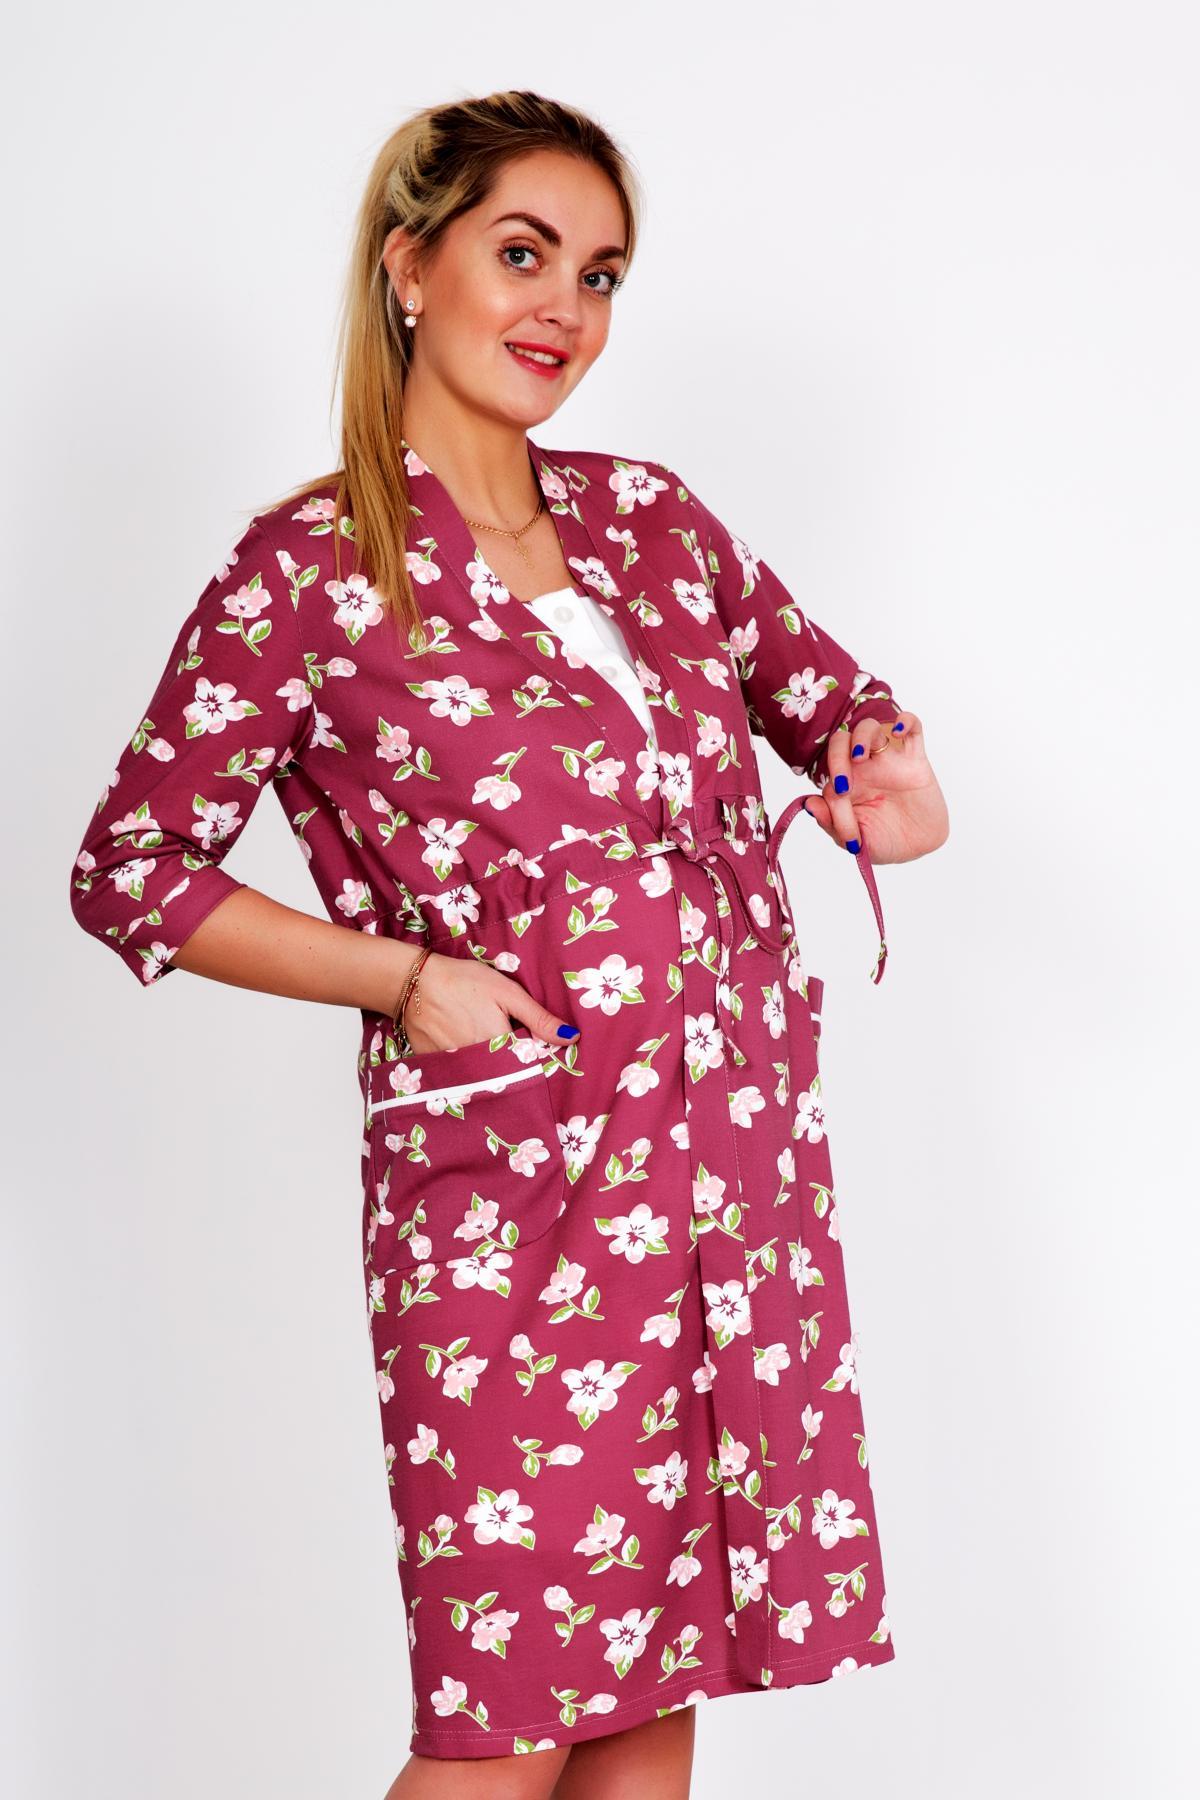 Жен. комплект Mia р. 50Ночные сорочки<br><br><br>Тип: Жен. комплект<br>Размер: 50<br>Материал: Кулирка